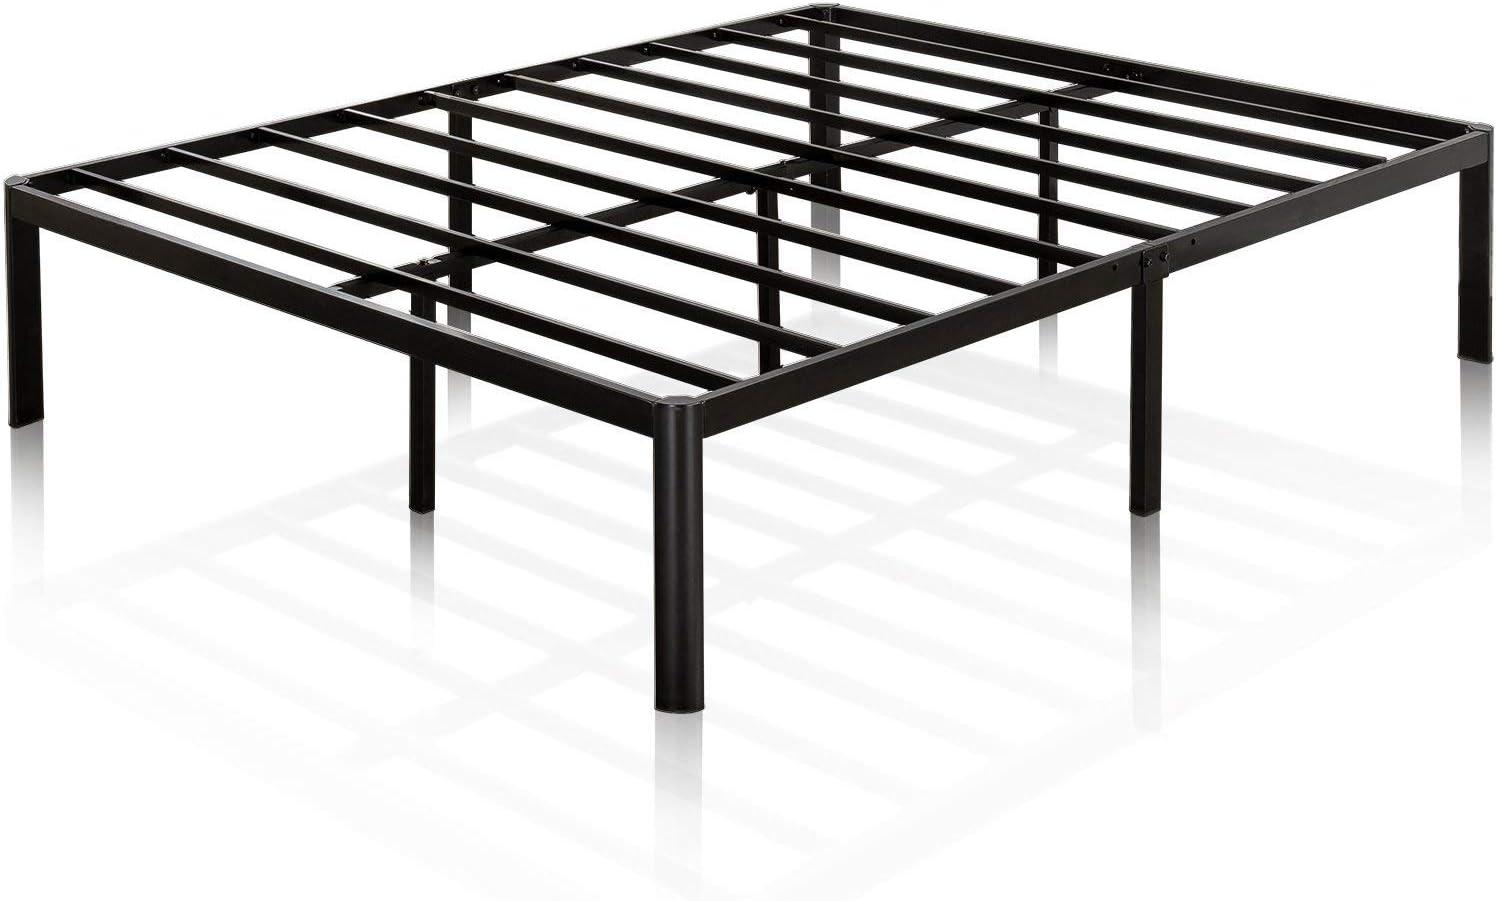 Zinus 16 Inch Metal Platform Bed with Steel Slat Support Mattress Foundation, King Renewed